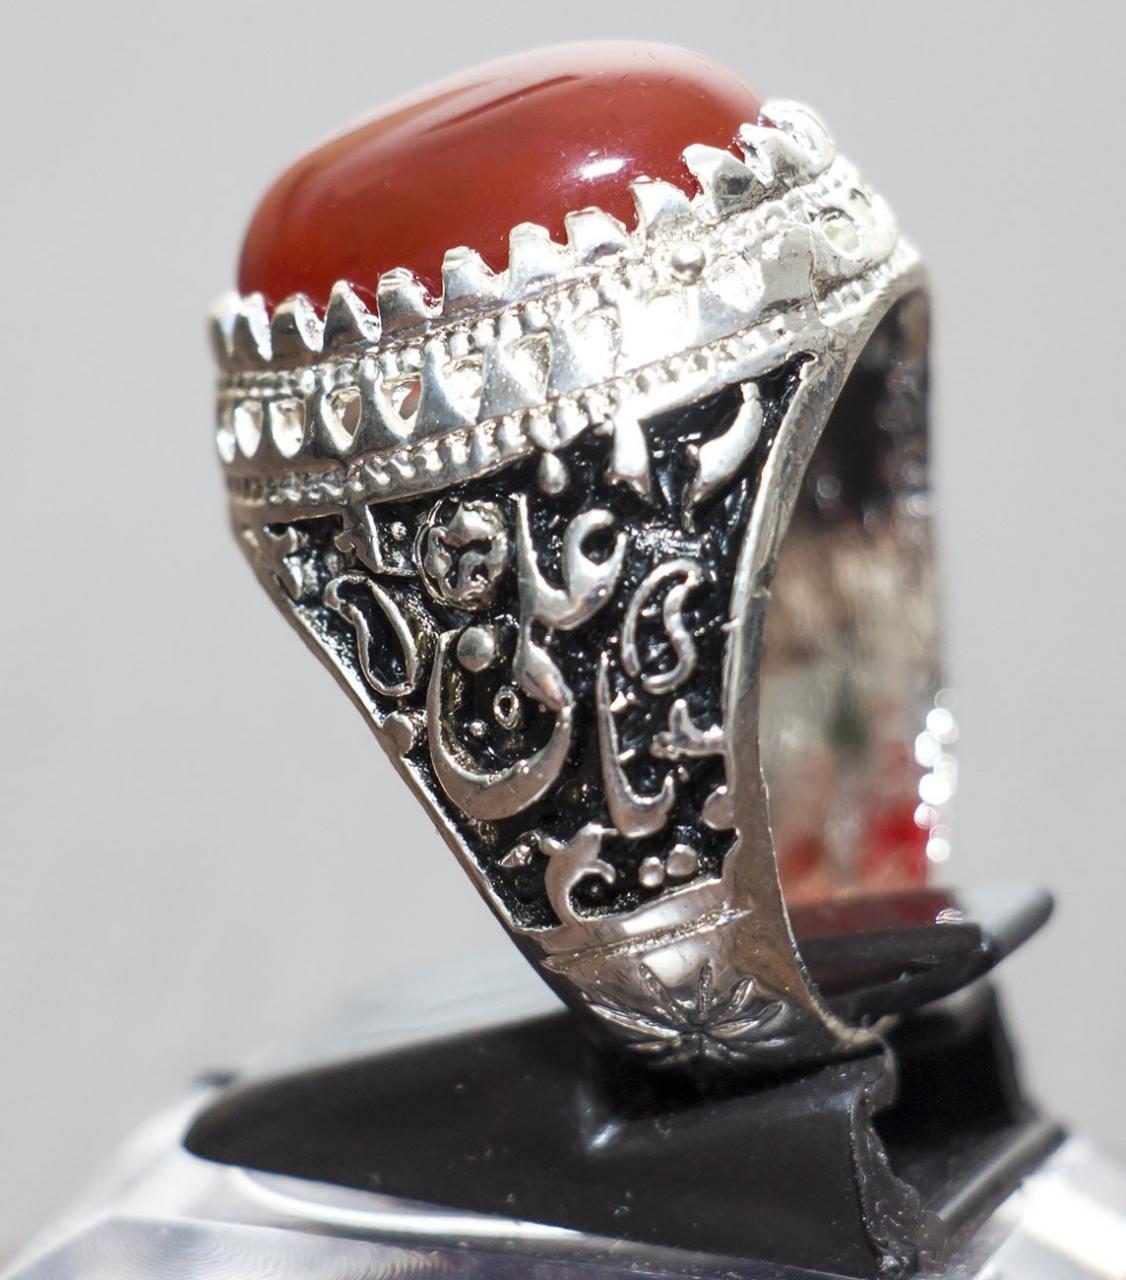 AqiqHerren Aqiq Ring Khorasani Stein in rot oval graviert mit Ya Zahra, Ya Hussein oder Ya Abal Fadl Alabbas